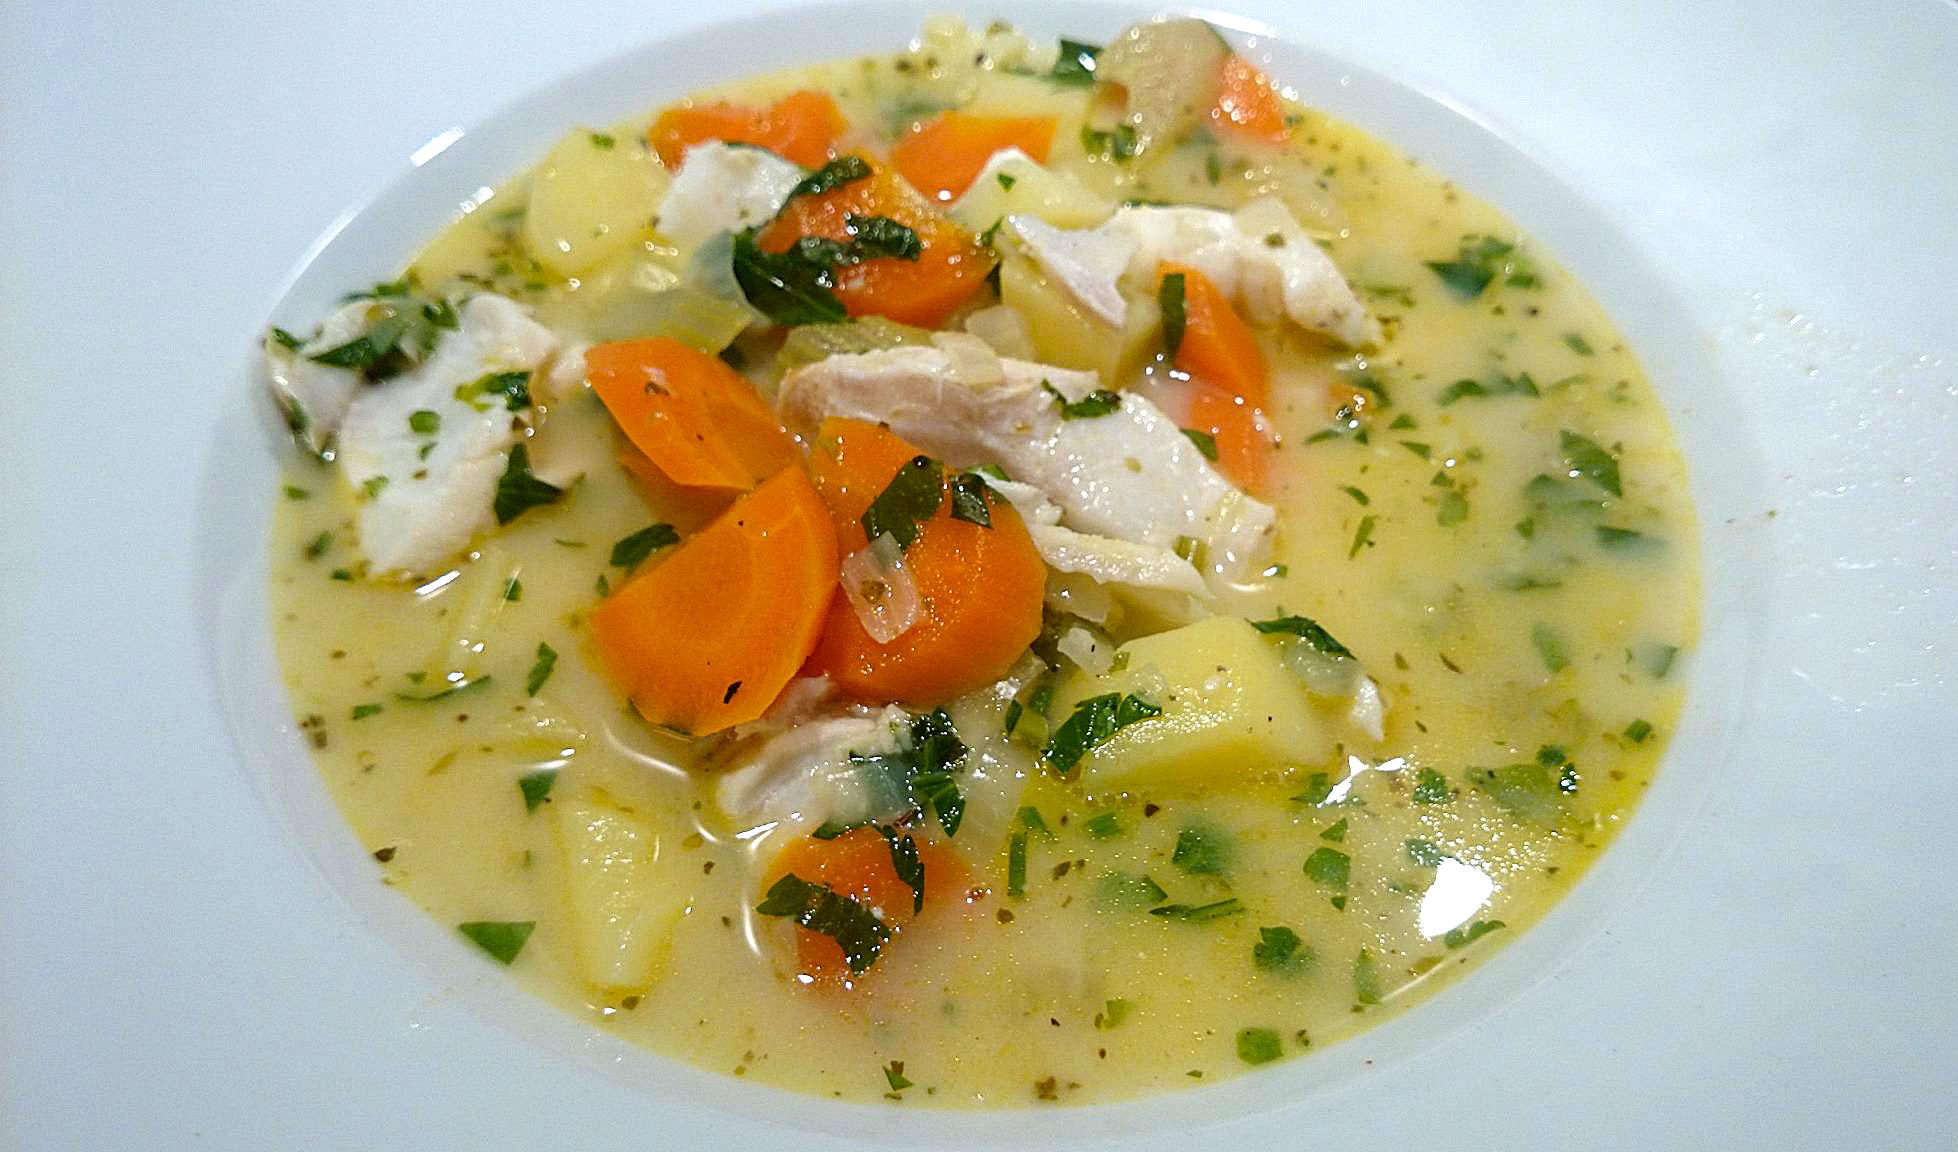 Griechische Fischsuppe mit Eier-Zitronen-Sauce - Psarosoupa avgolemono